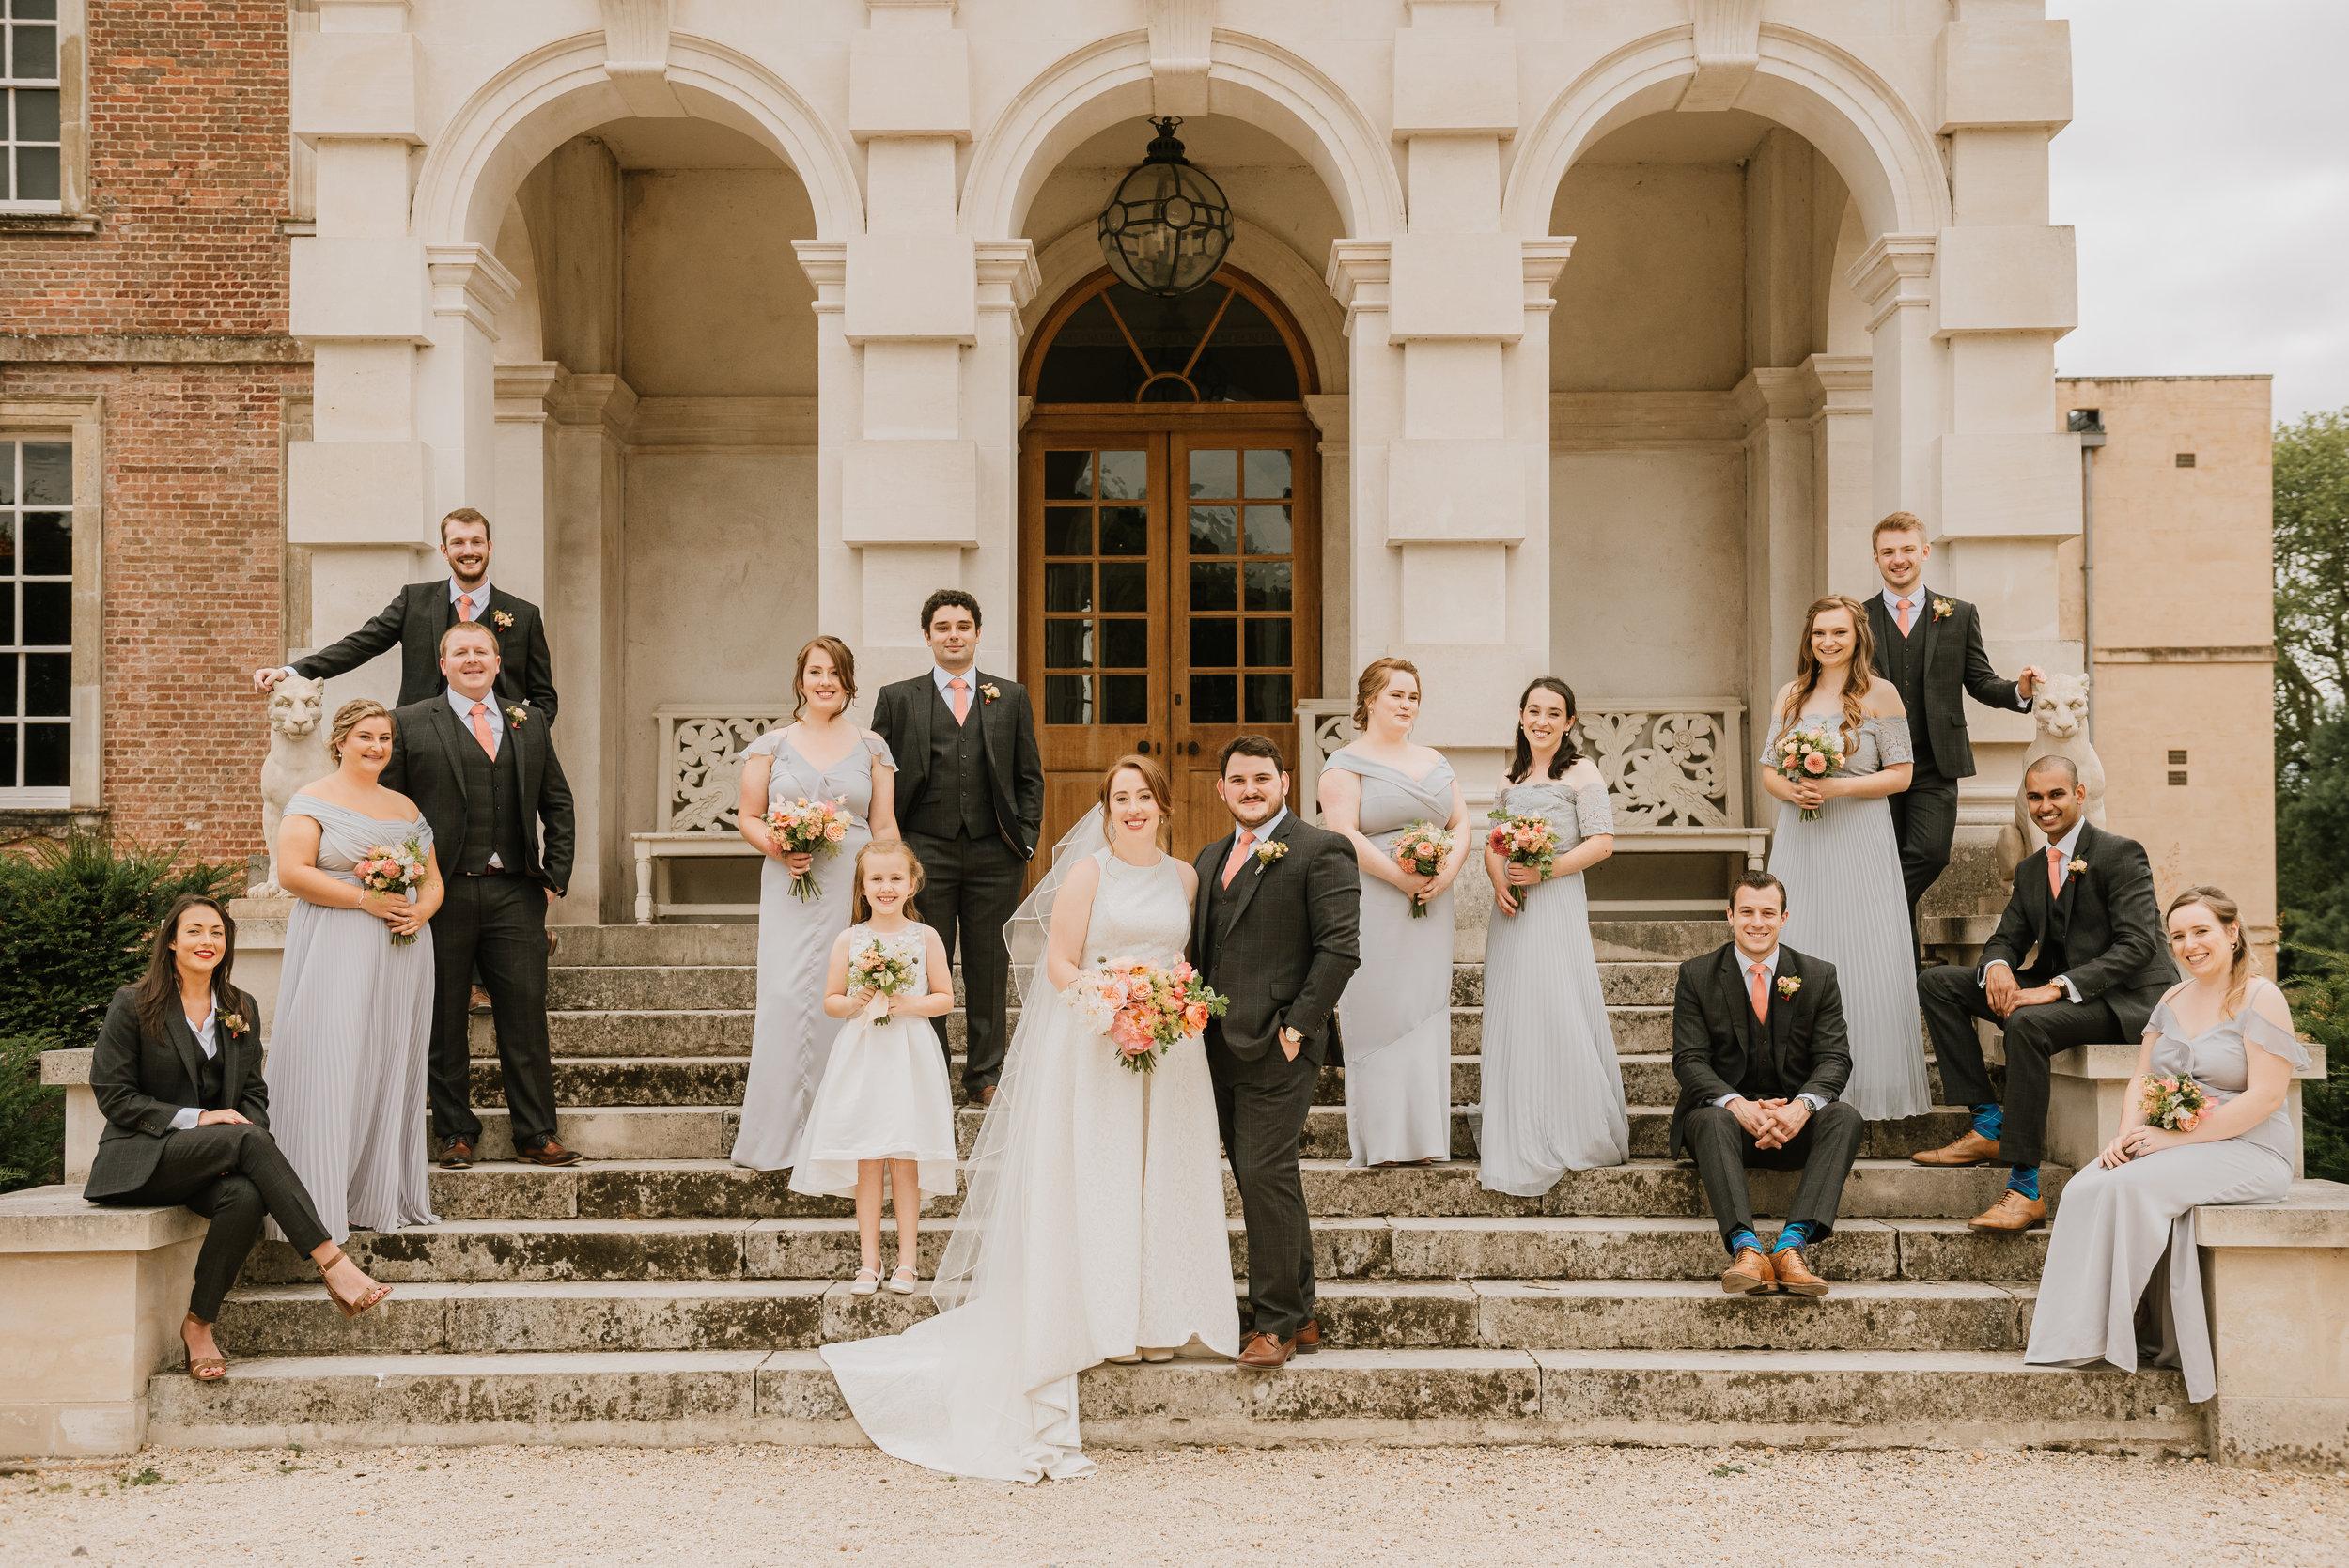 St Giles Wedding Photographer